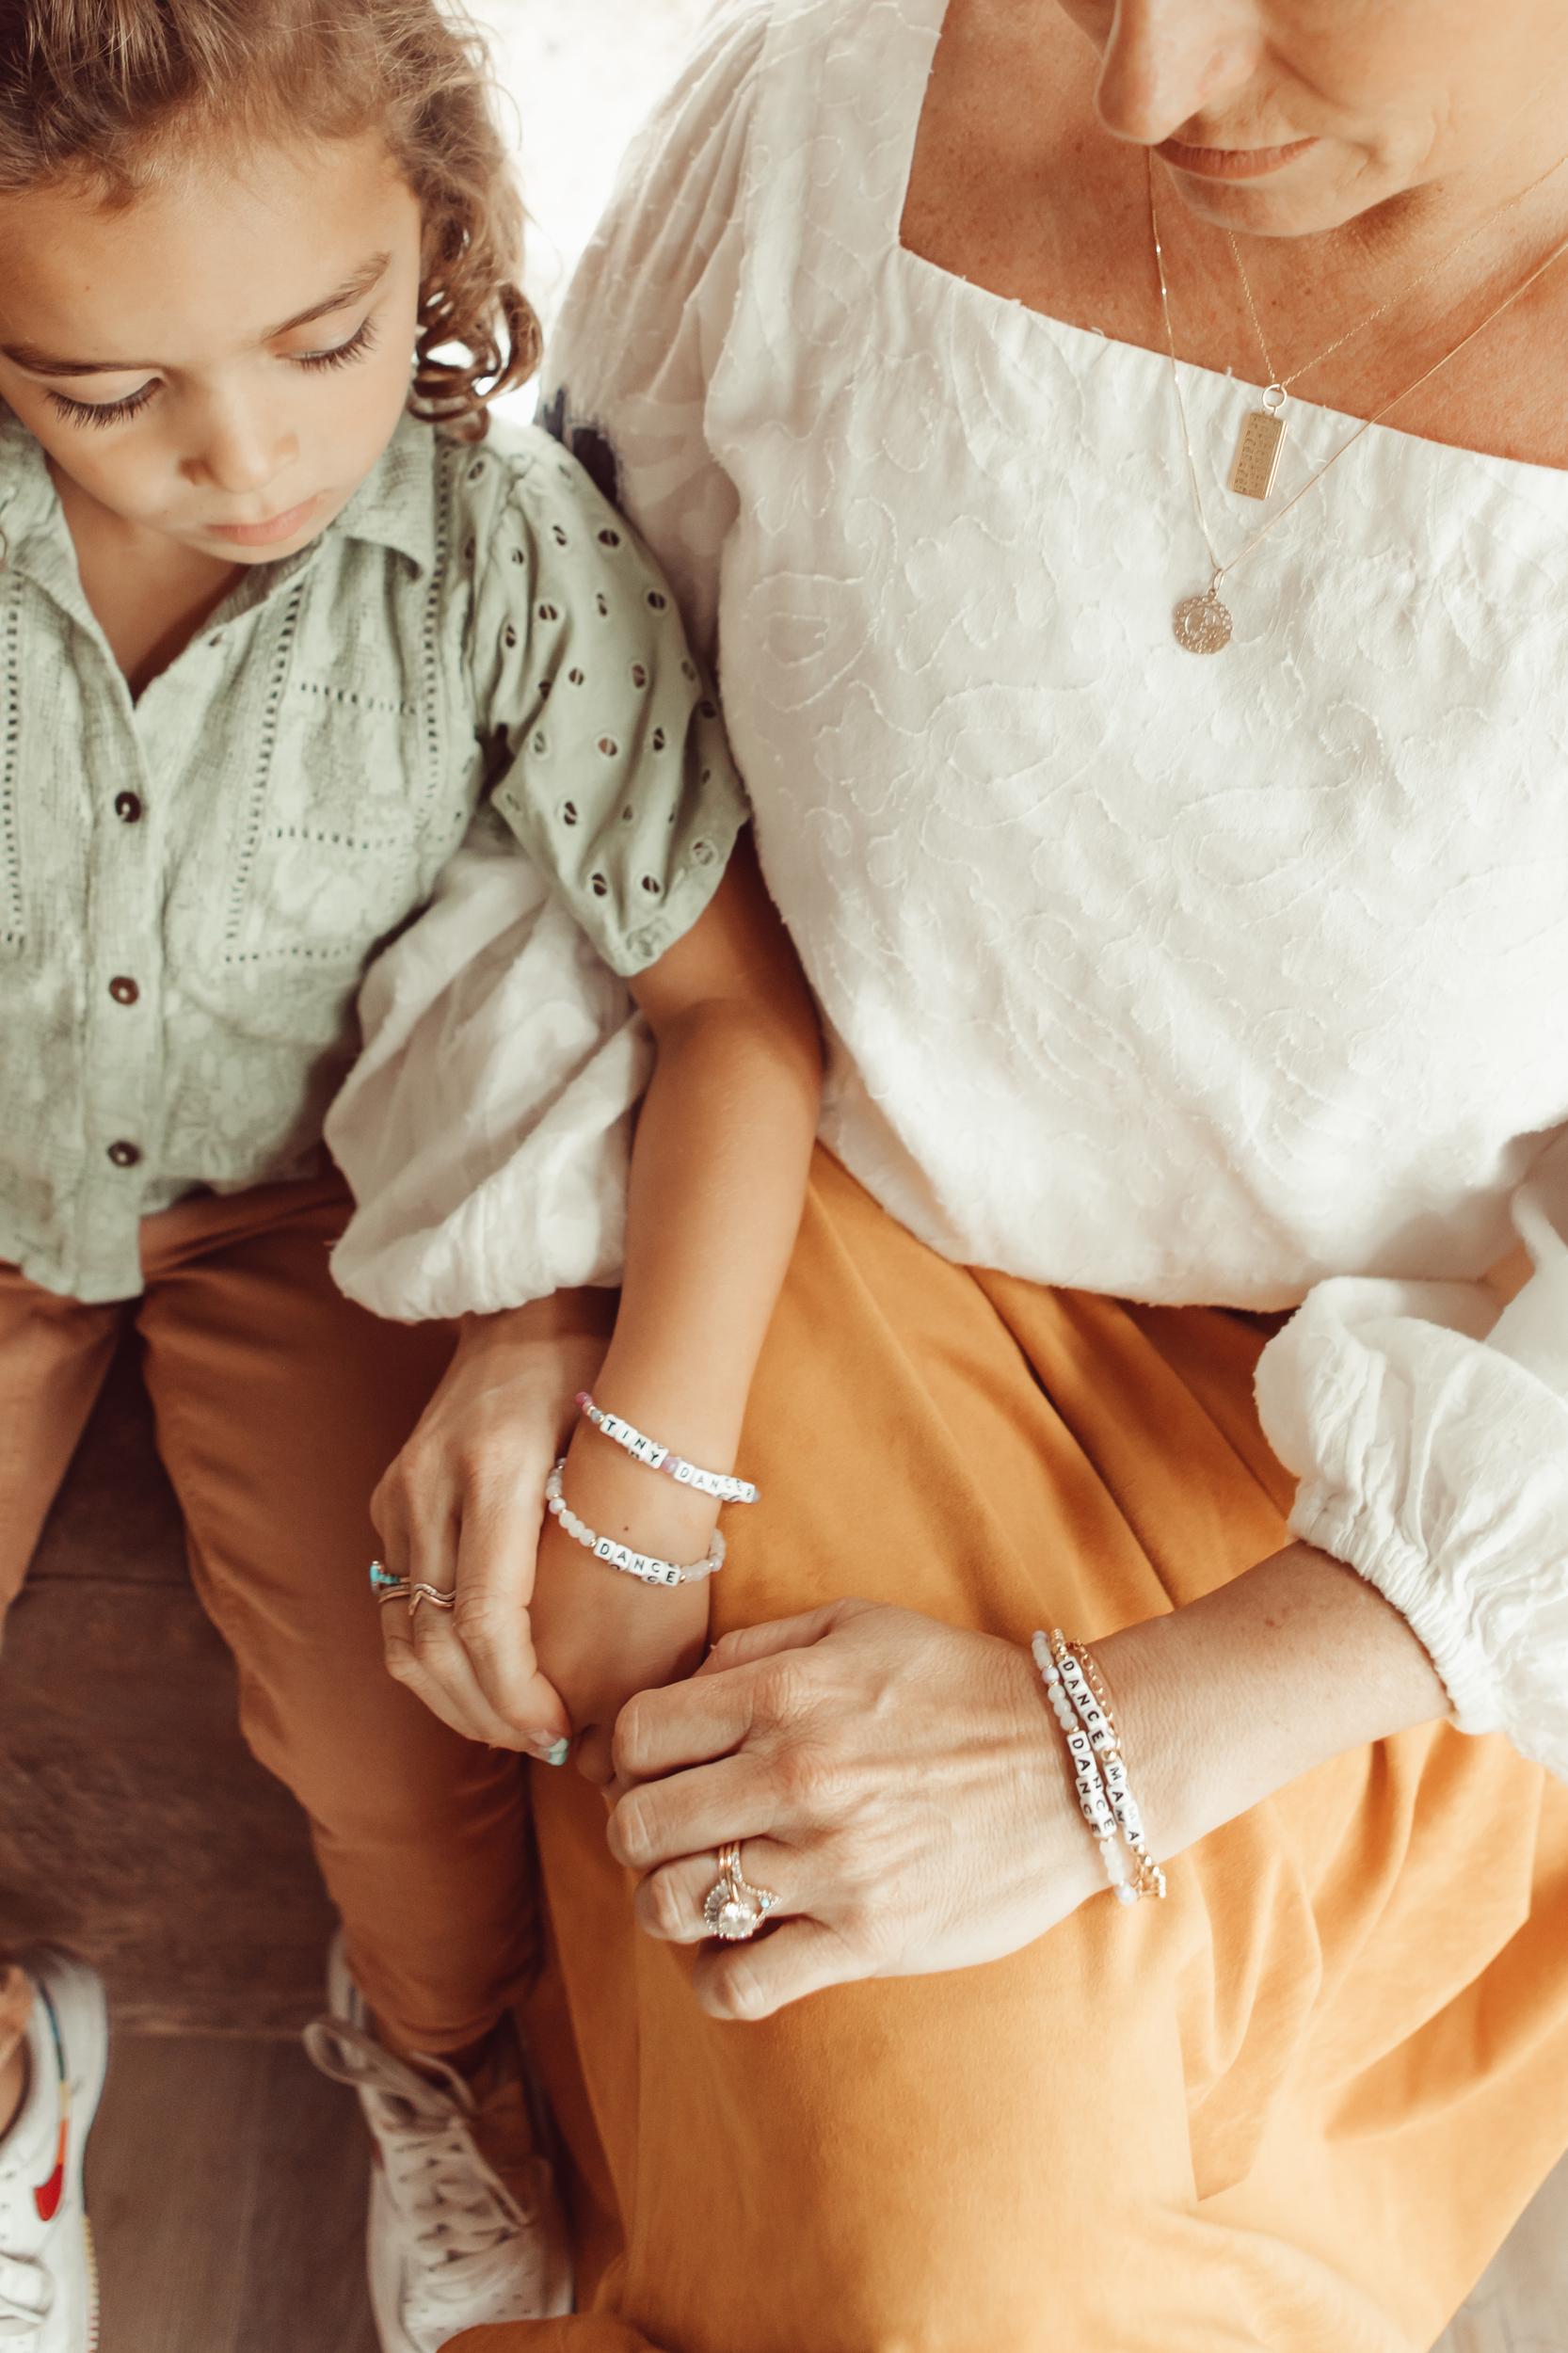 mom and child matching bracelets